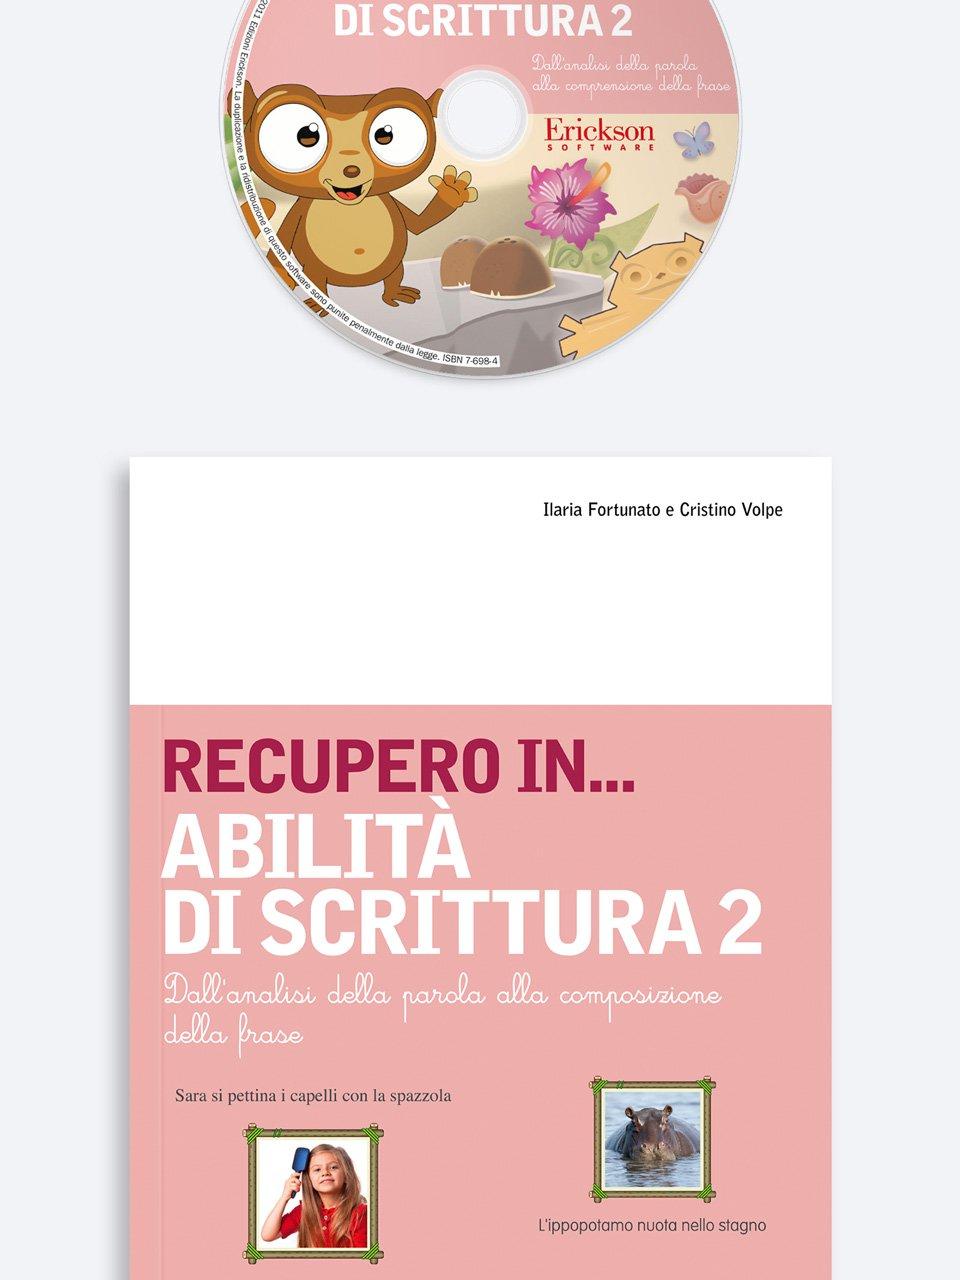 RECUPERO IN... Abilità di scrittura 2 - Abilità cognitive - Vol. 1: Percezione visiva - Libri - Erickson 3